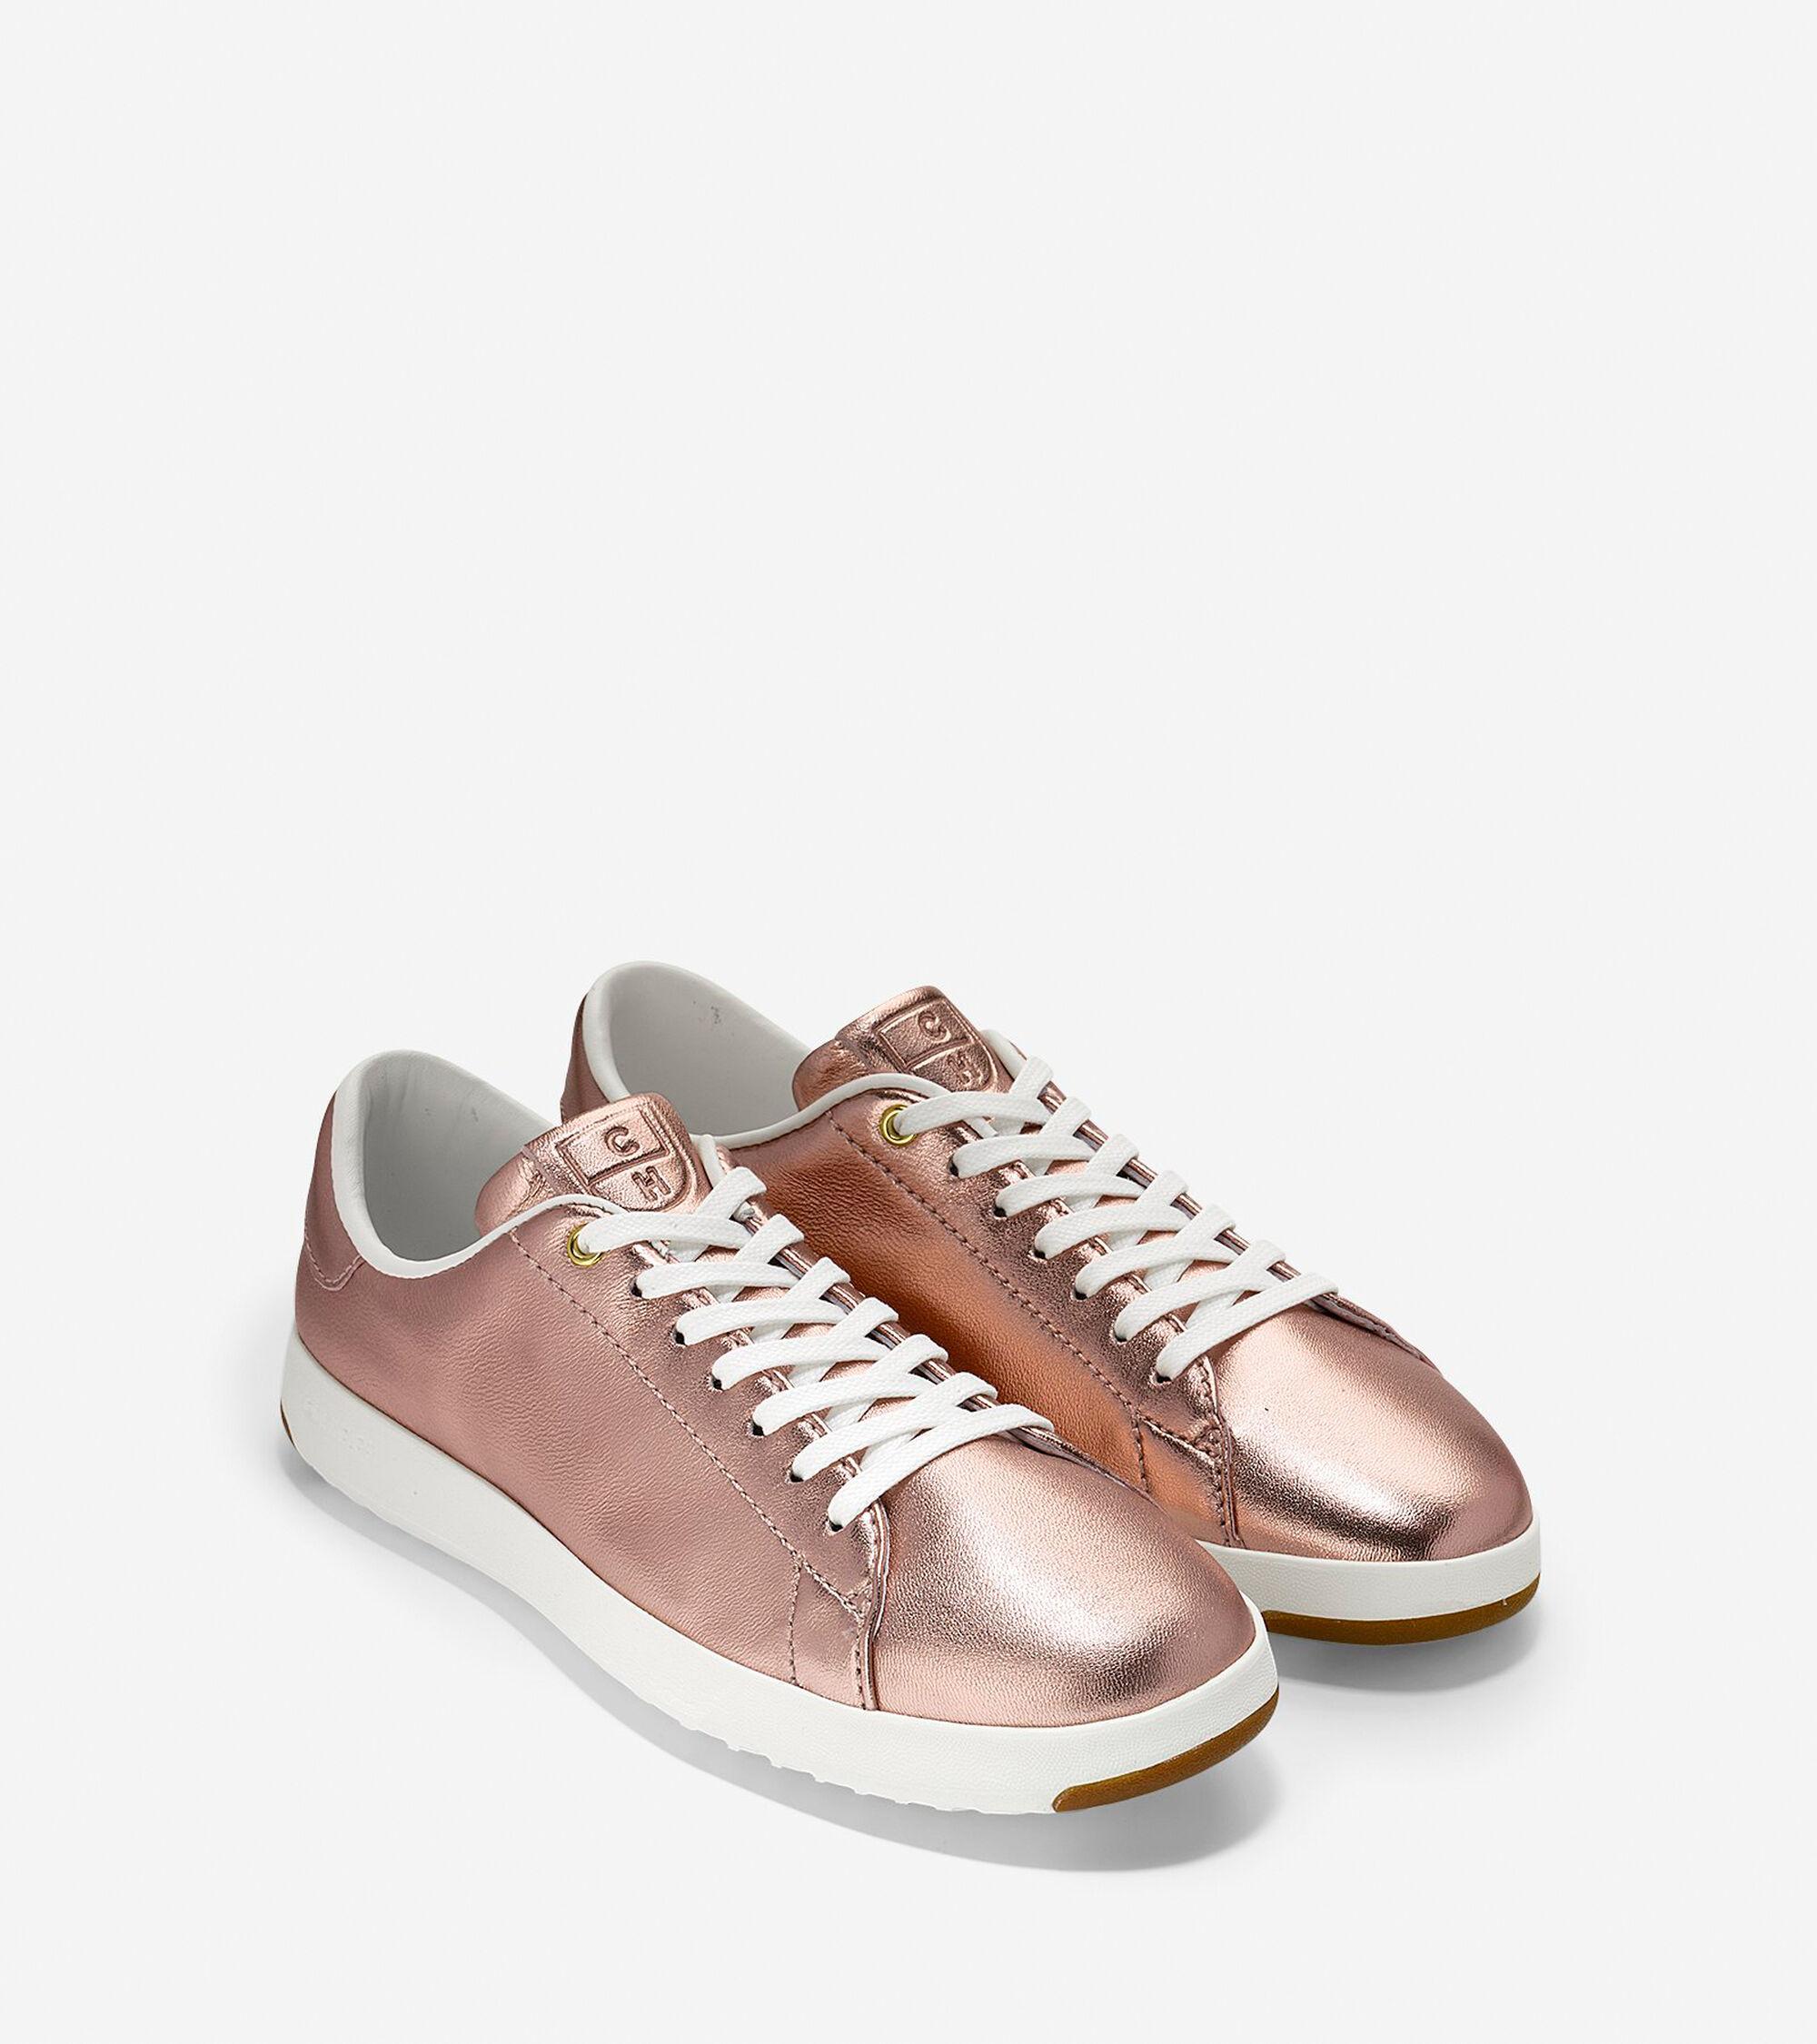 women 39 s grandpro tennis sneakers in metallic rose gold. Black Bedroom Furniture Sets. Home Design Ideas